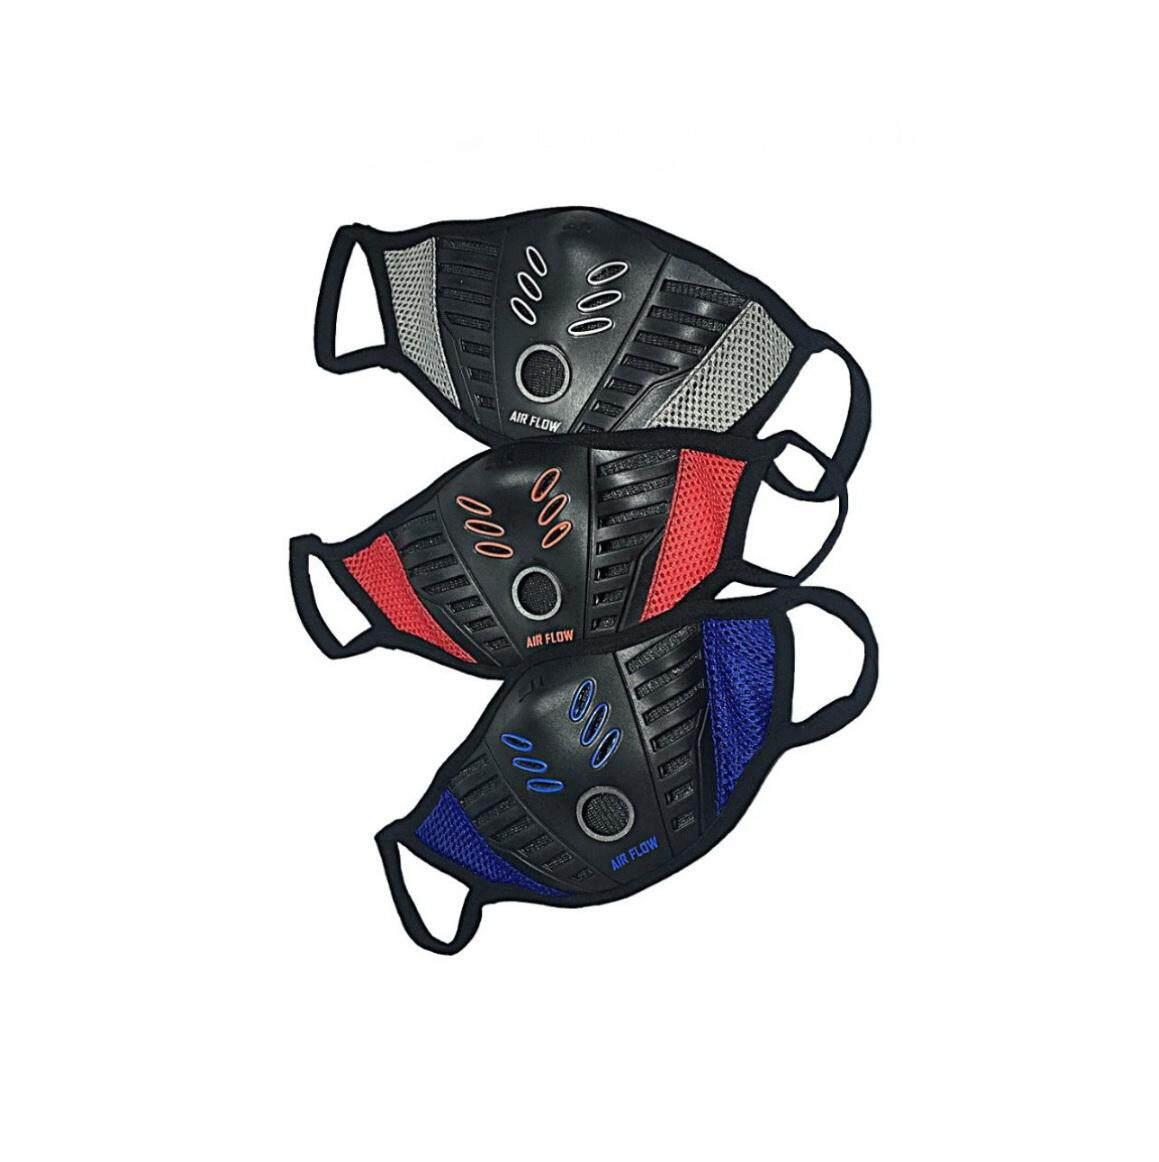 M1 หน้ากากผ้าปิดจมูกกรองฝุ่น รุ่น K5 Airflow By Gloves Headsupport Mask.